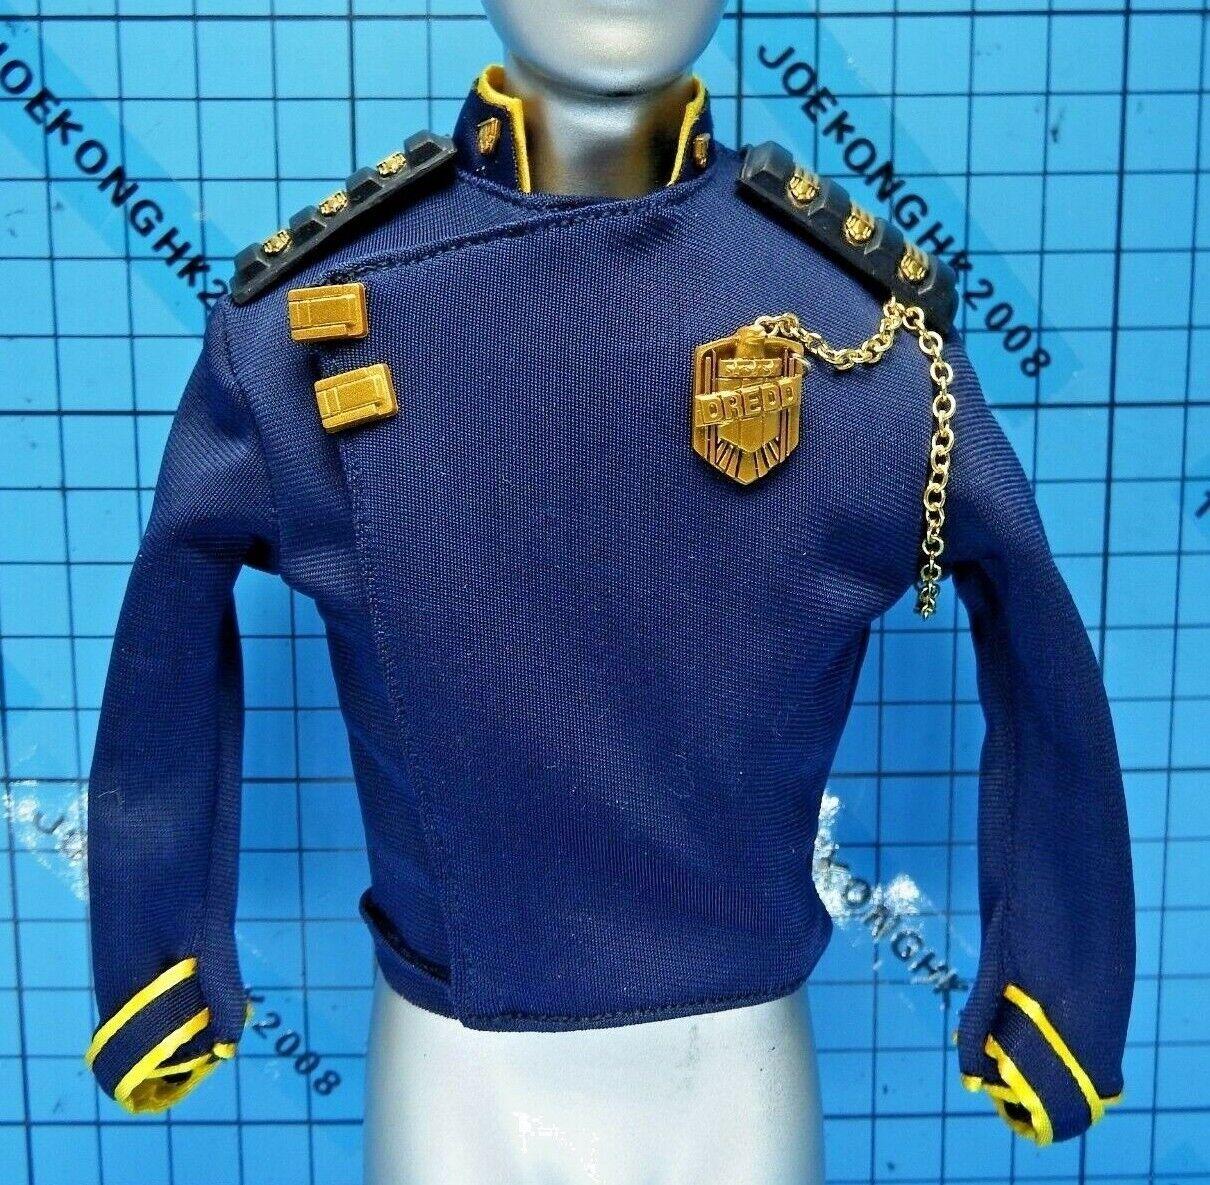 Vts bis 6 vm-023 justiz judge drotd bild - blaue uniform + schulterriemen